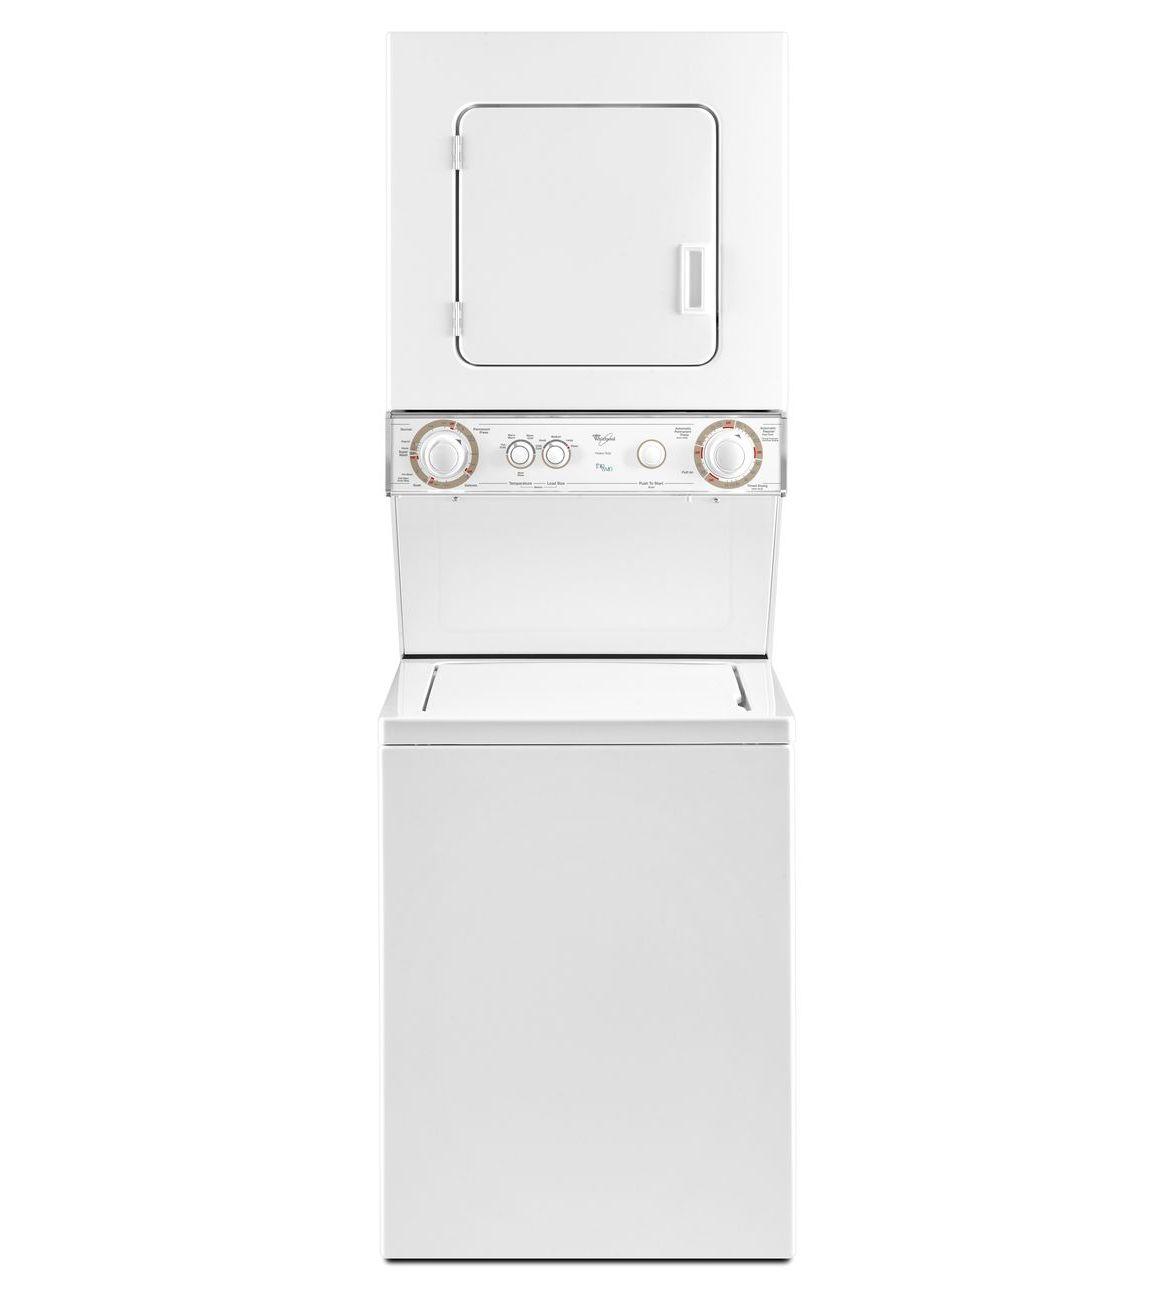 Diagram Besides Whirlpool Dryer Wiring Diagram On Whirlpool Gas Dryer